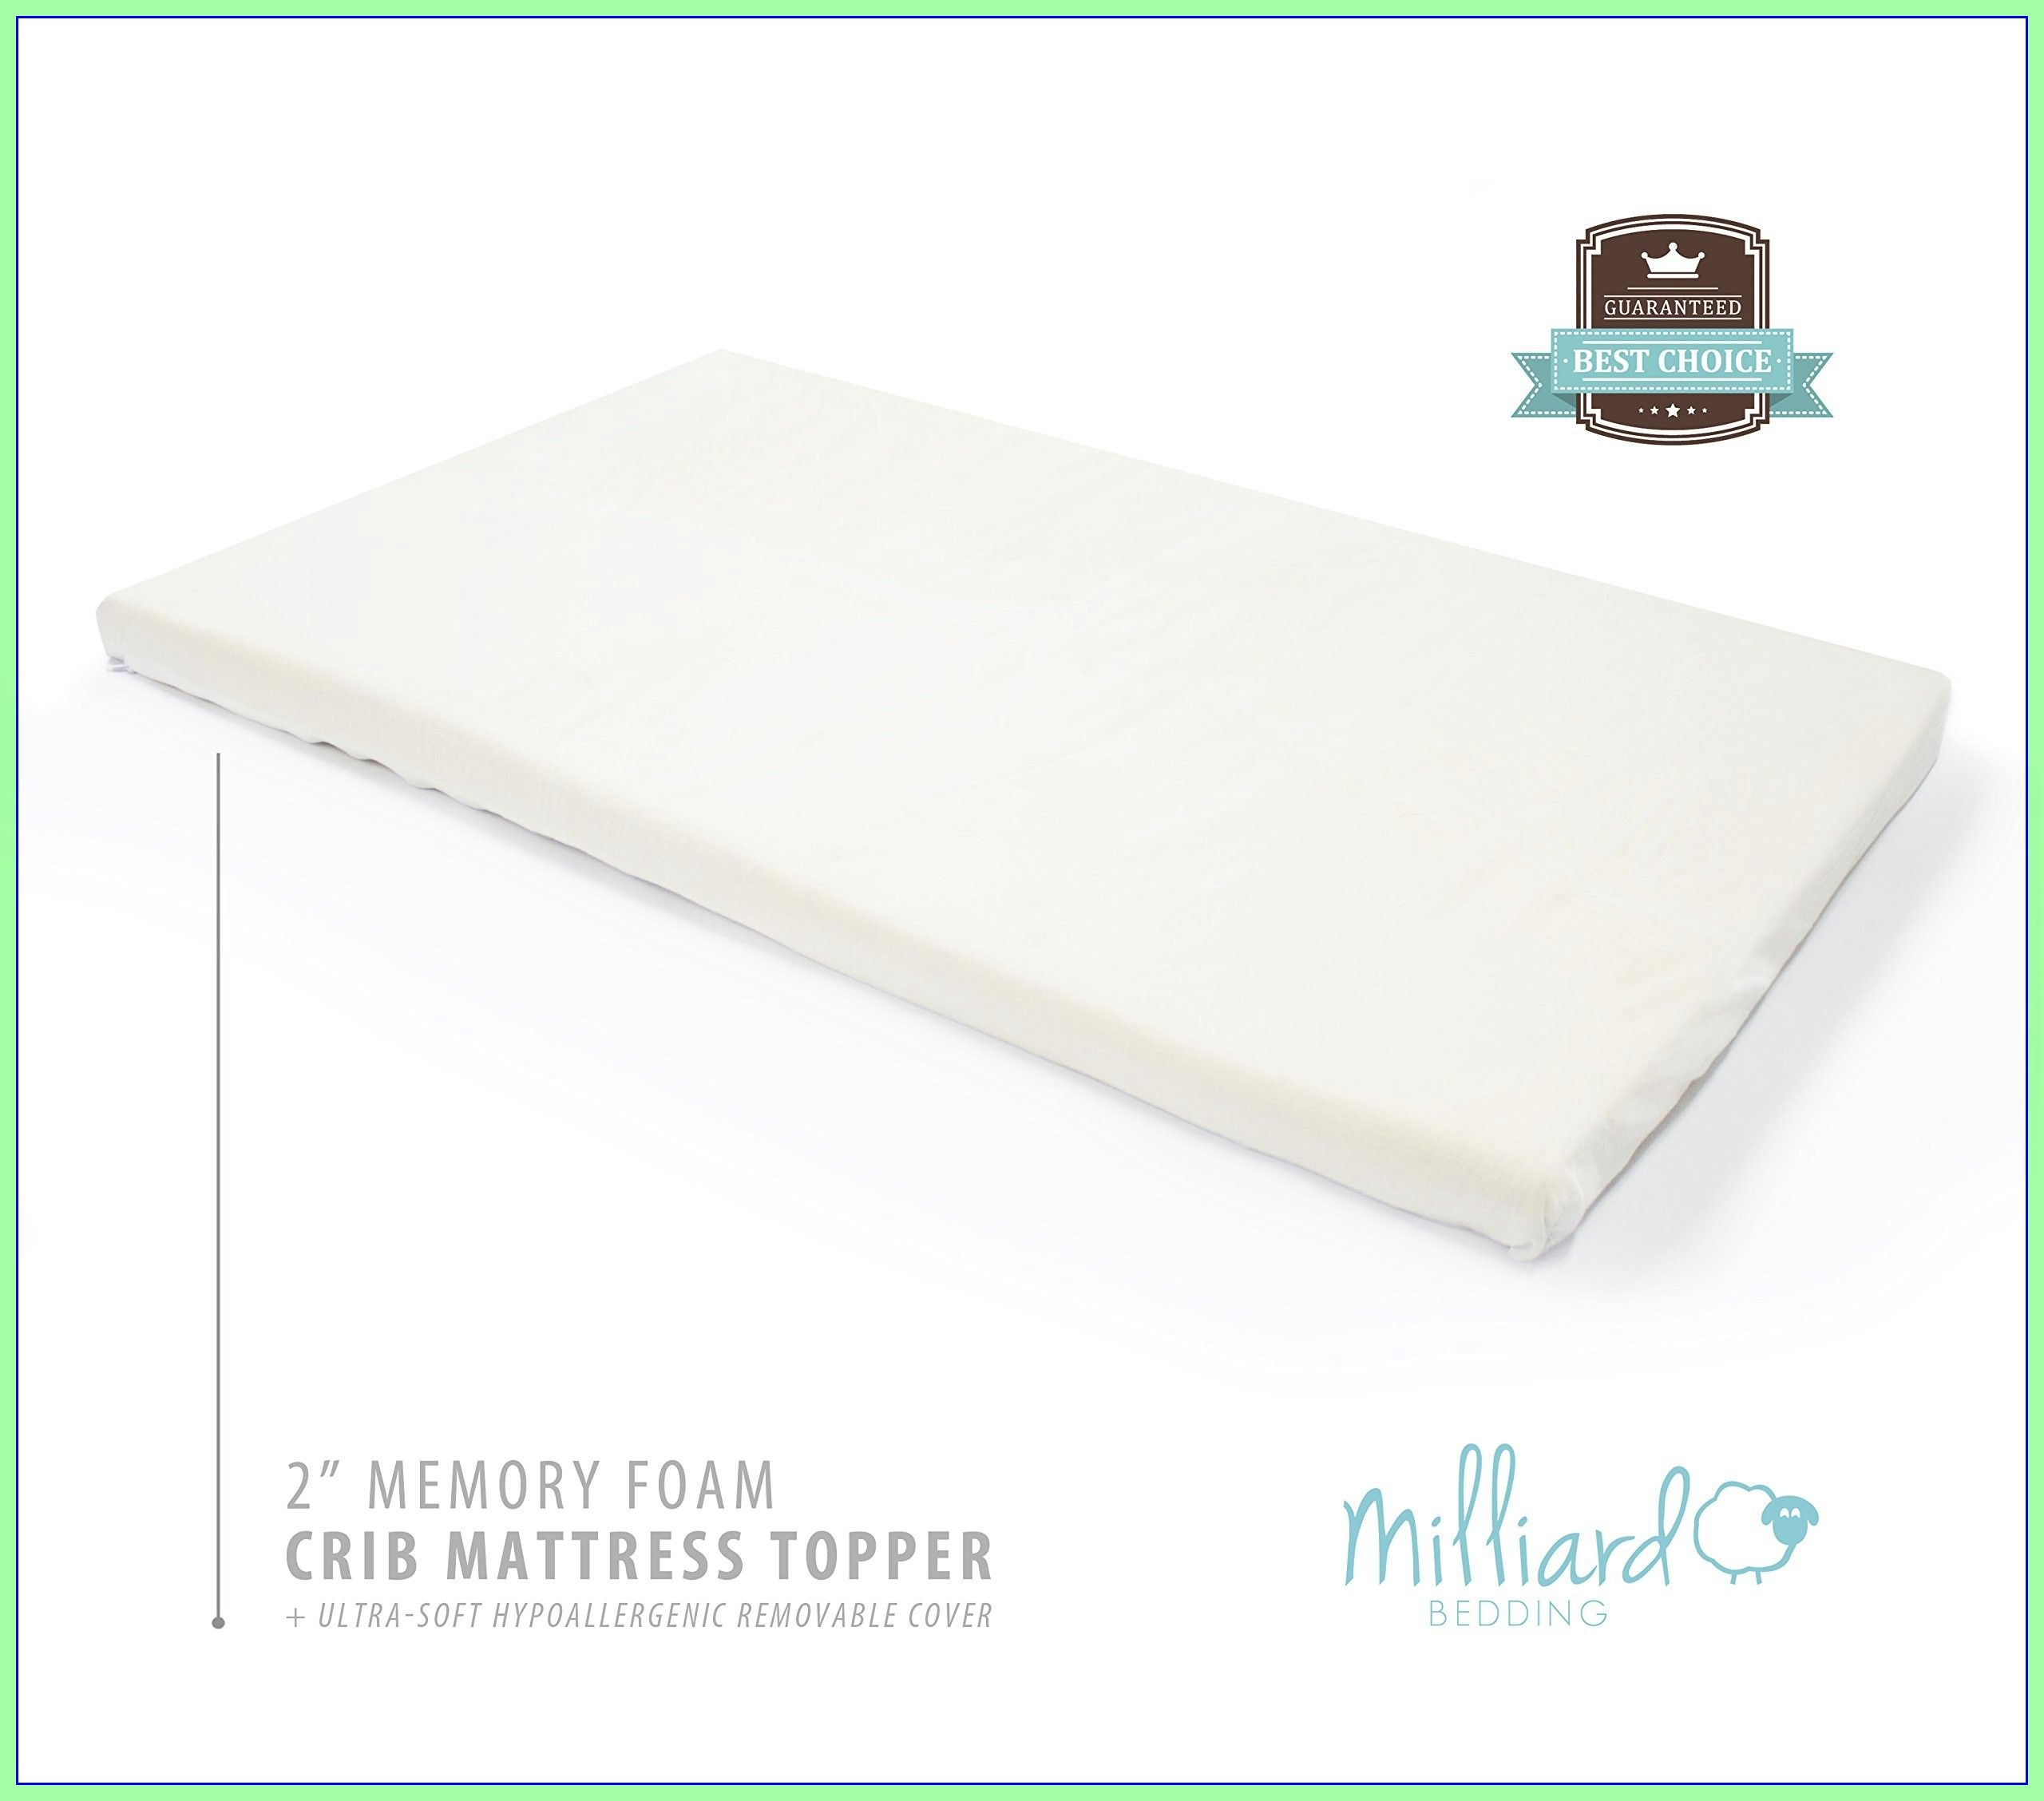 57 Reference Of Crib Mattress Memory Foam In 2020 Crib Mattress Topper Crib Mattress Pad Crib Mattress Cover